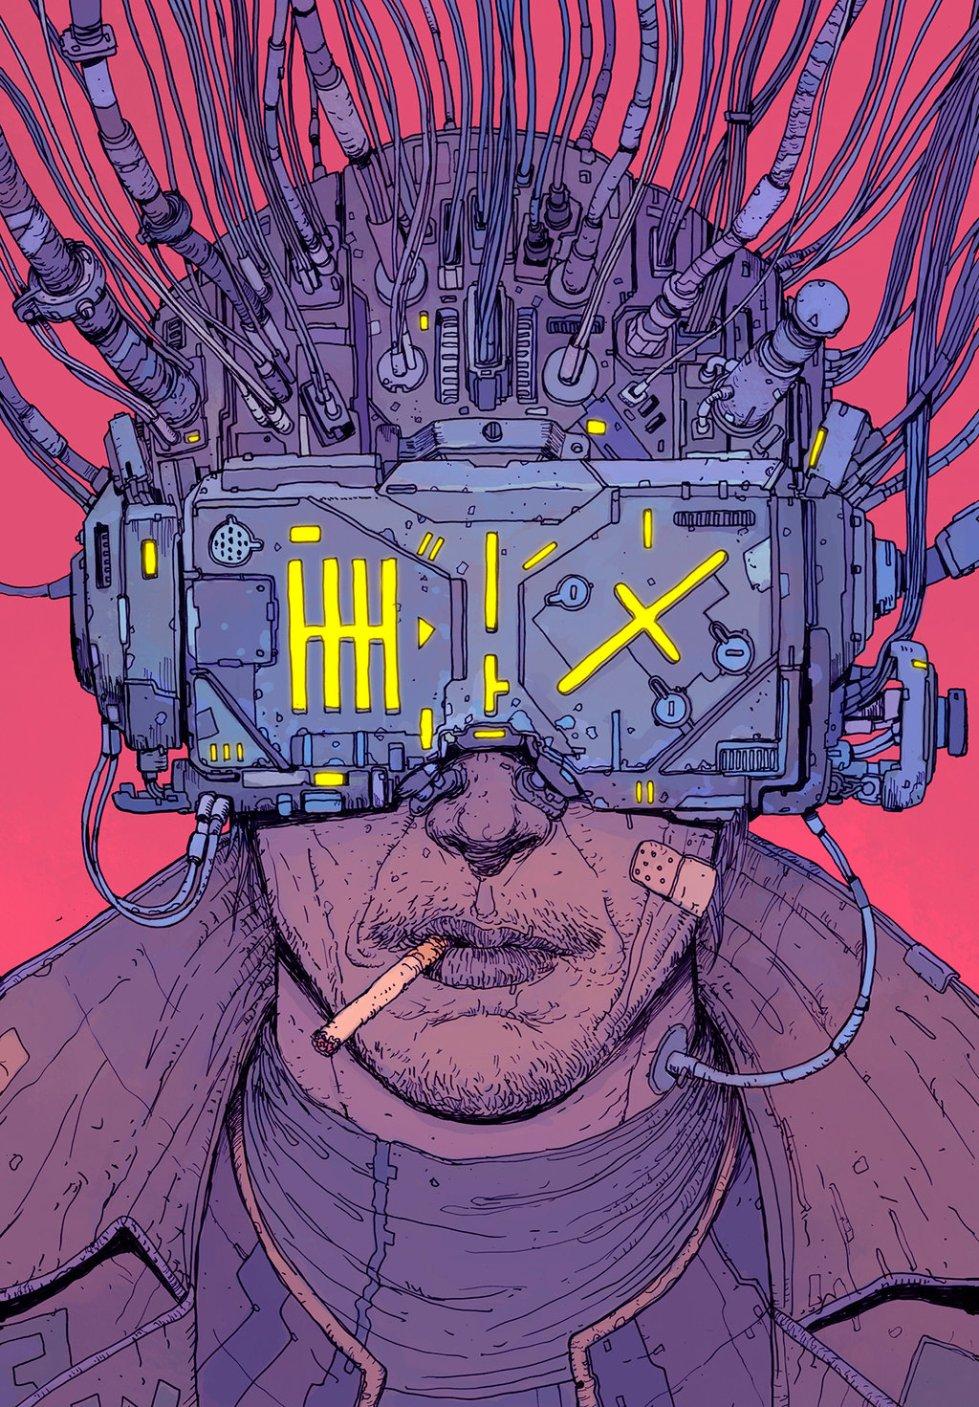 Josan Gonzalez neuromancer__brazilian_edition_cover__by_f1x_2-daf7qtk